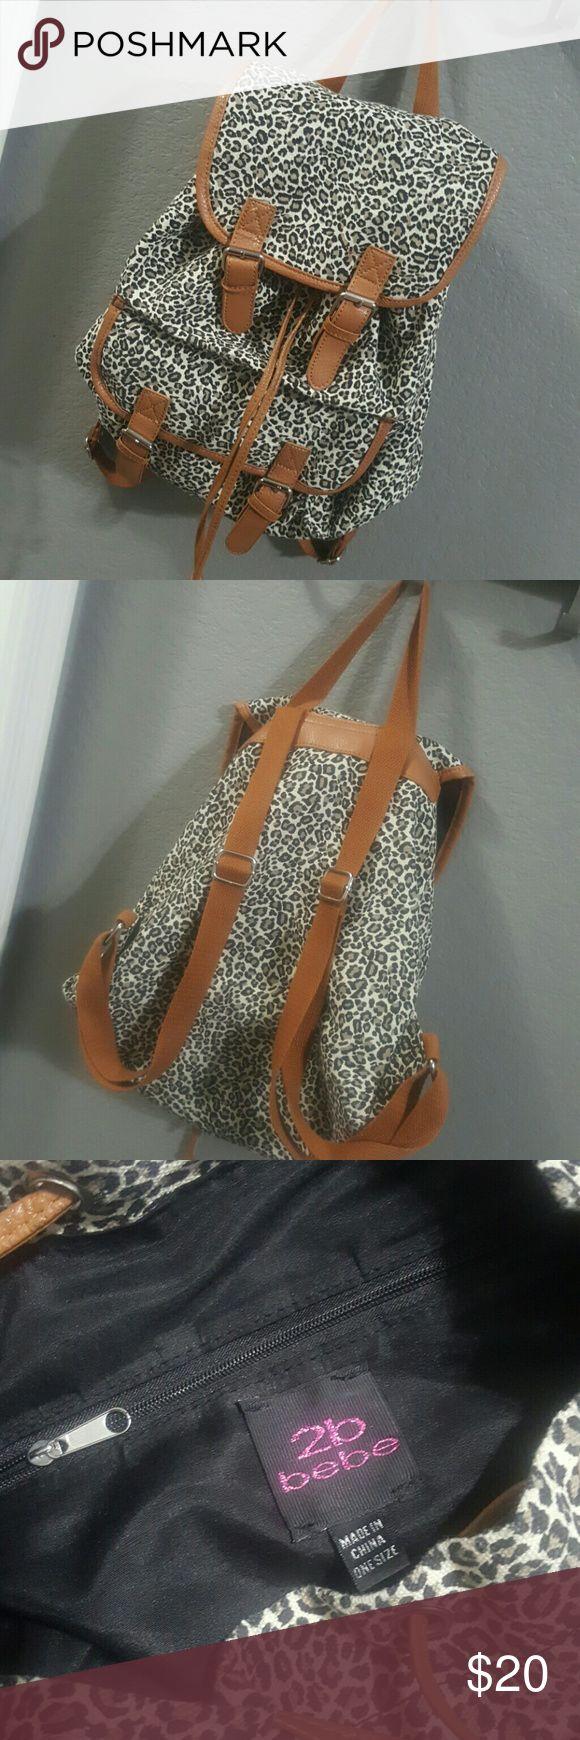 Bebe cheetah print back pack Cheetah print back pack with plenty of room for storage. Used once. bebe Bags Backpacks